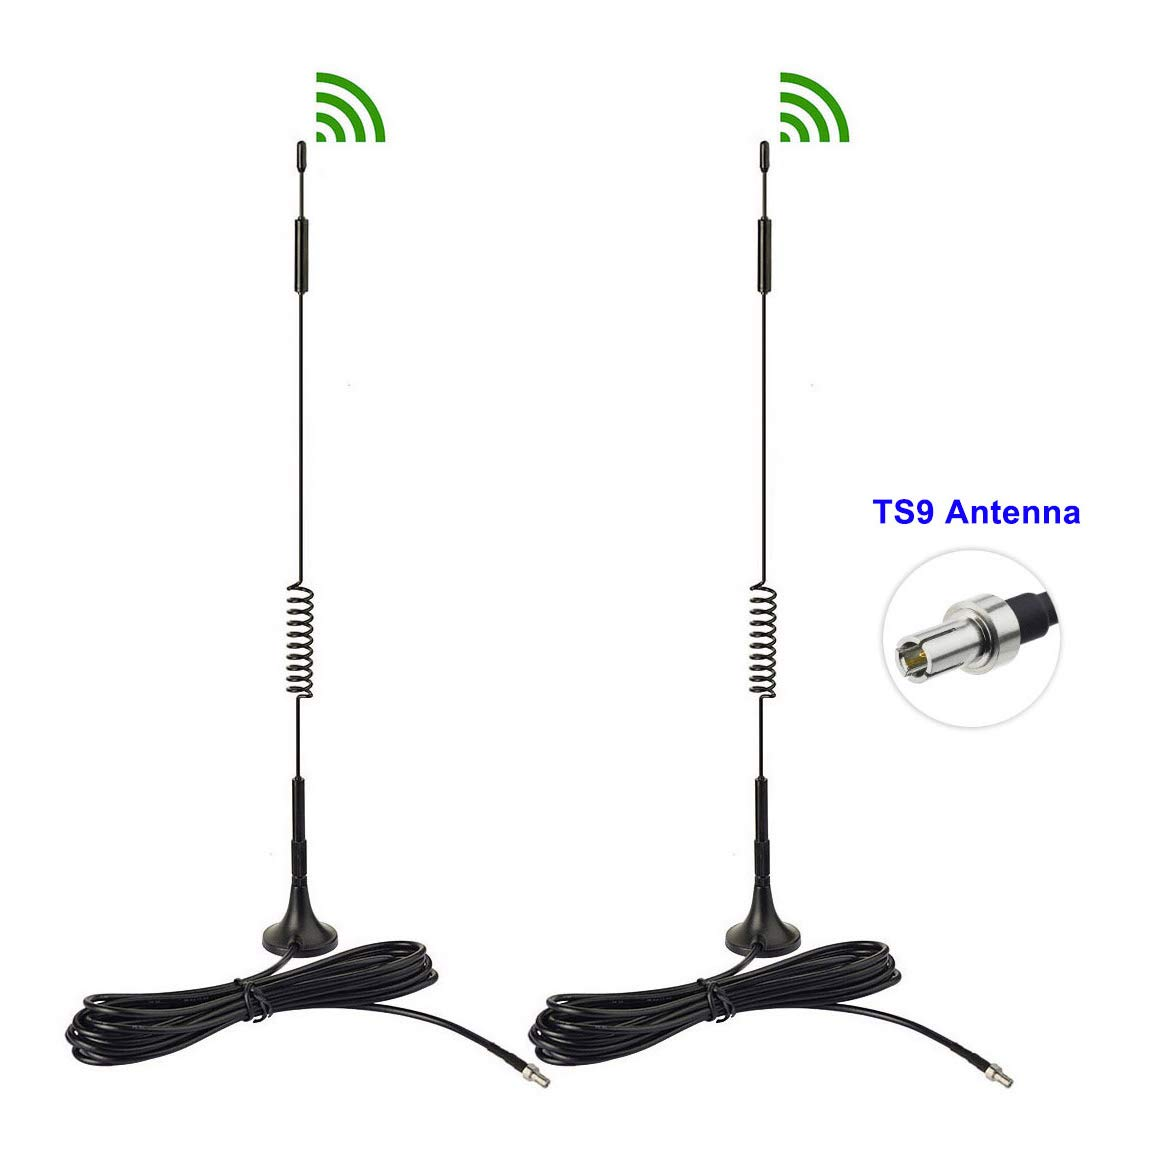 Bingfu 4G LTE 7dBi Magnetic Base TS9 Antenna (2-Pack) for MiFi Mobile Hotspot Router USB Modem Verizon Jetpack 8800L 7730L AC791L 6620L AT&T ZTE Velocity Netgear LB1120 Nighthawk M1 MR1100 Unite 770S by Bingfu